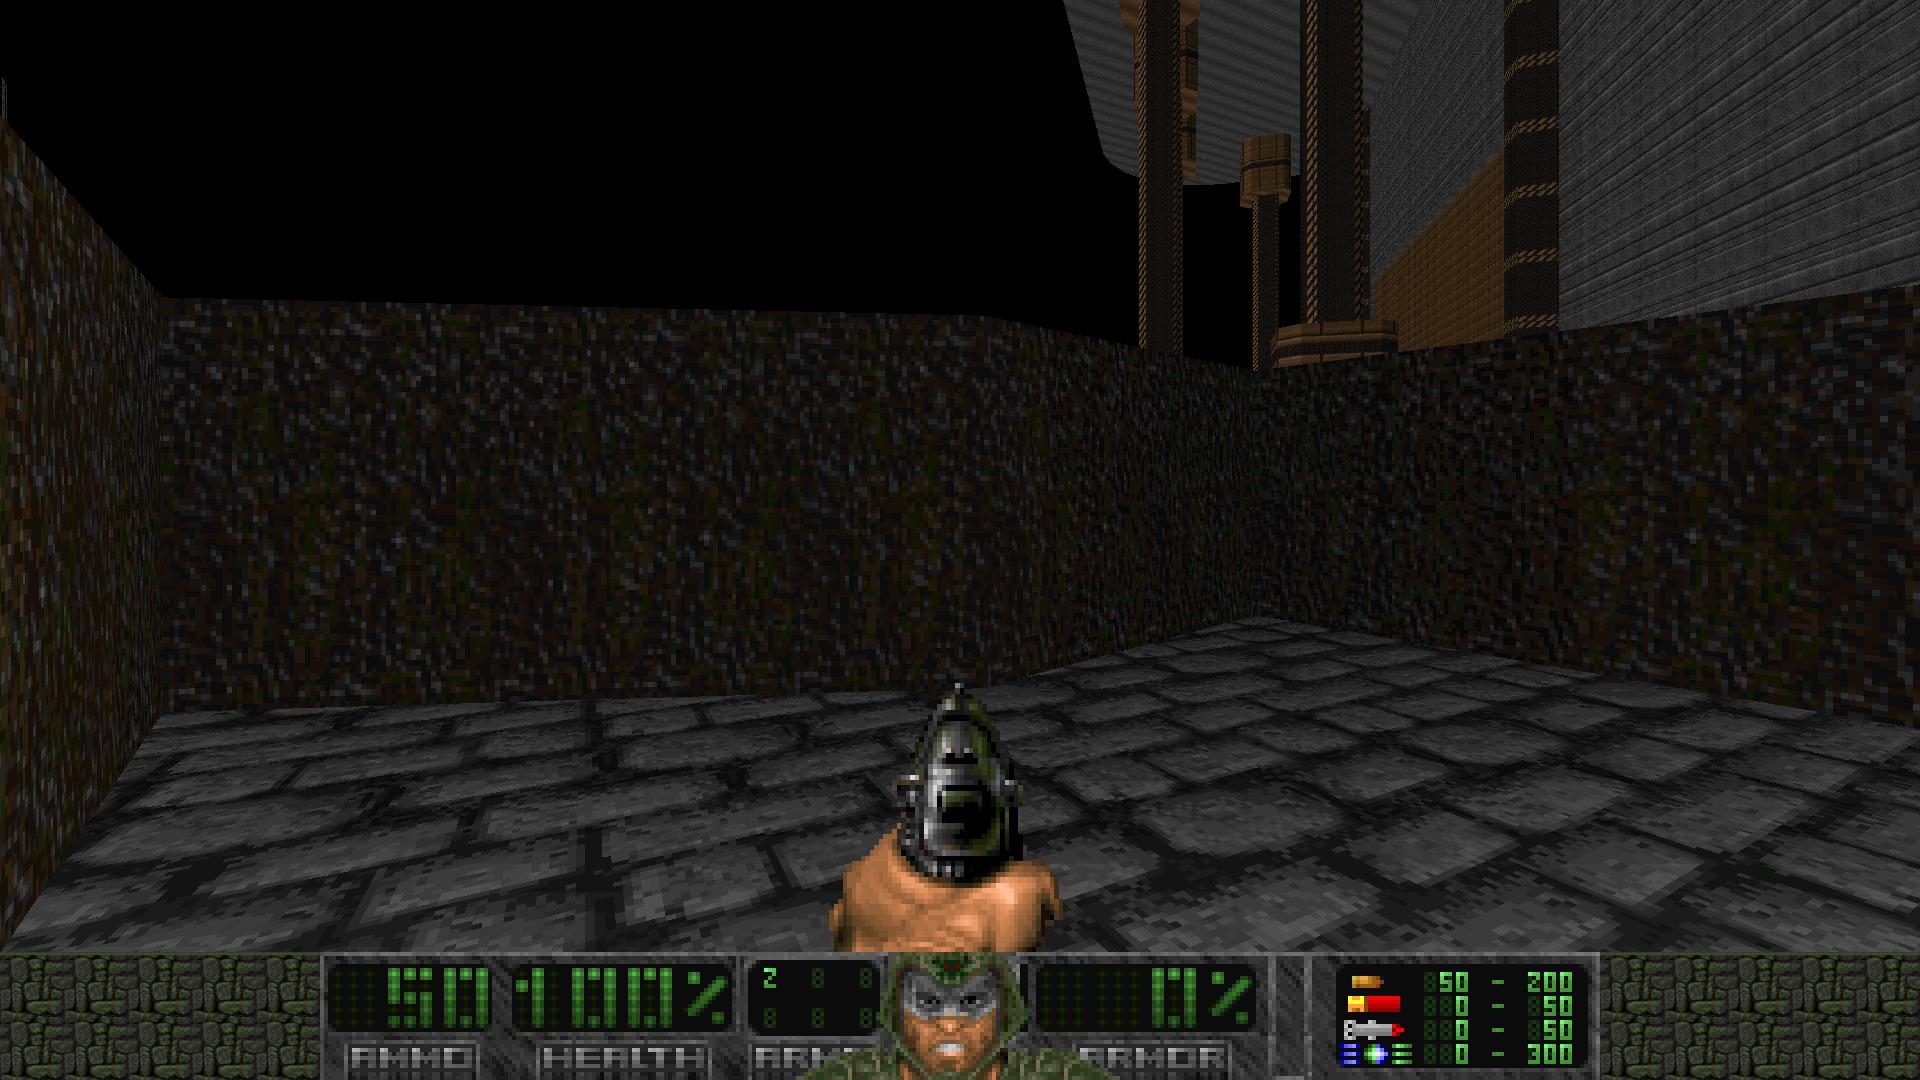 Screenshot_Doom_20210430_210829.png.be8310e50412a35ca67a6063e1ae68b2.png